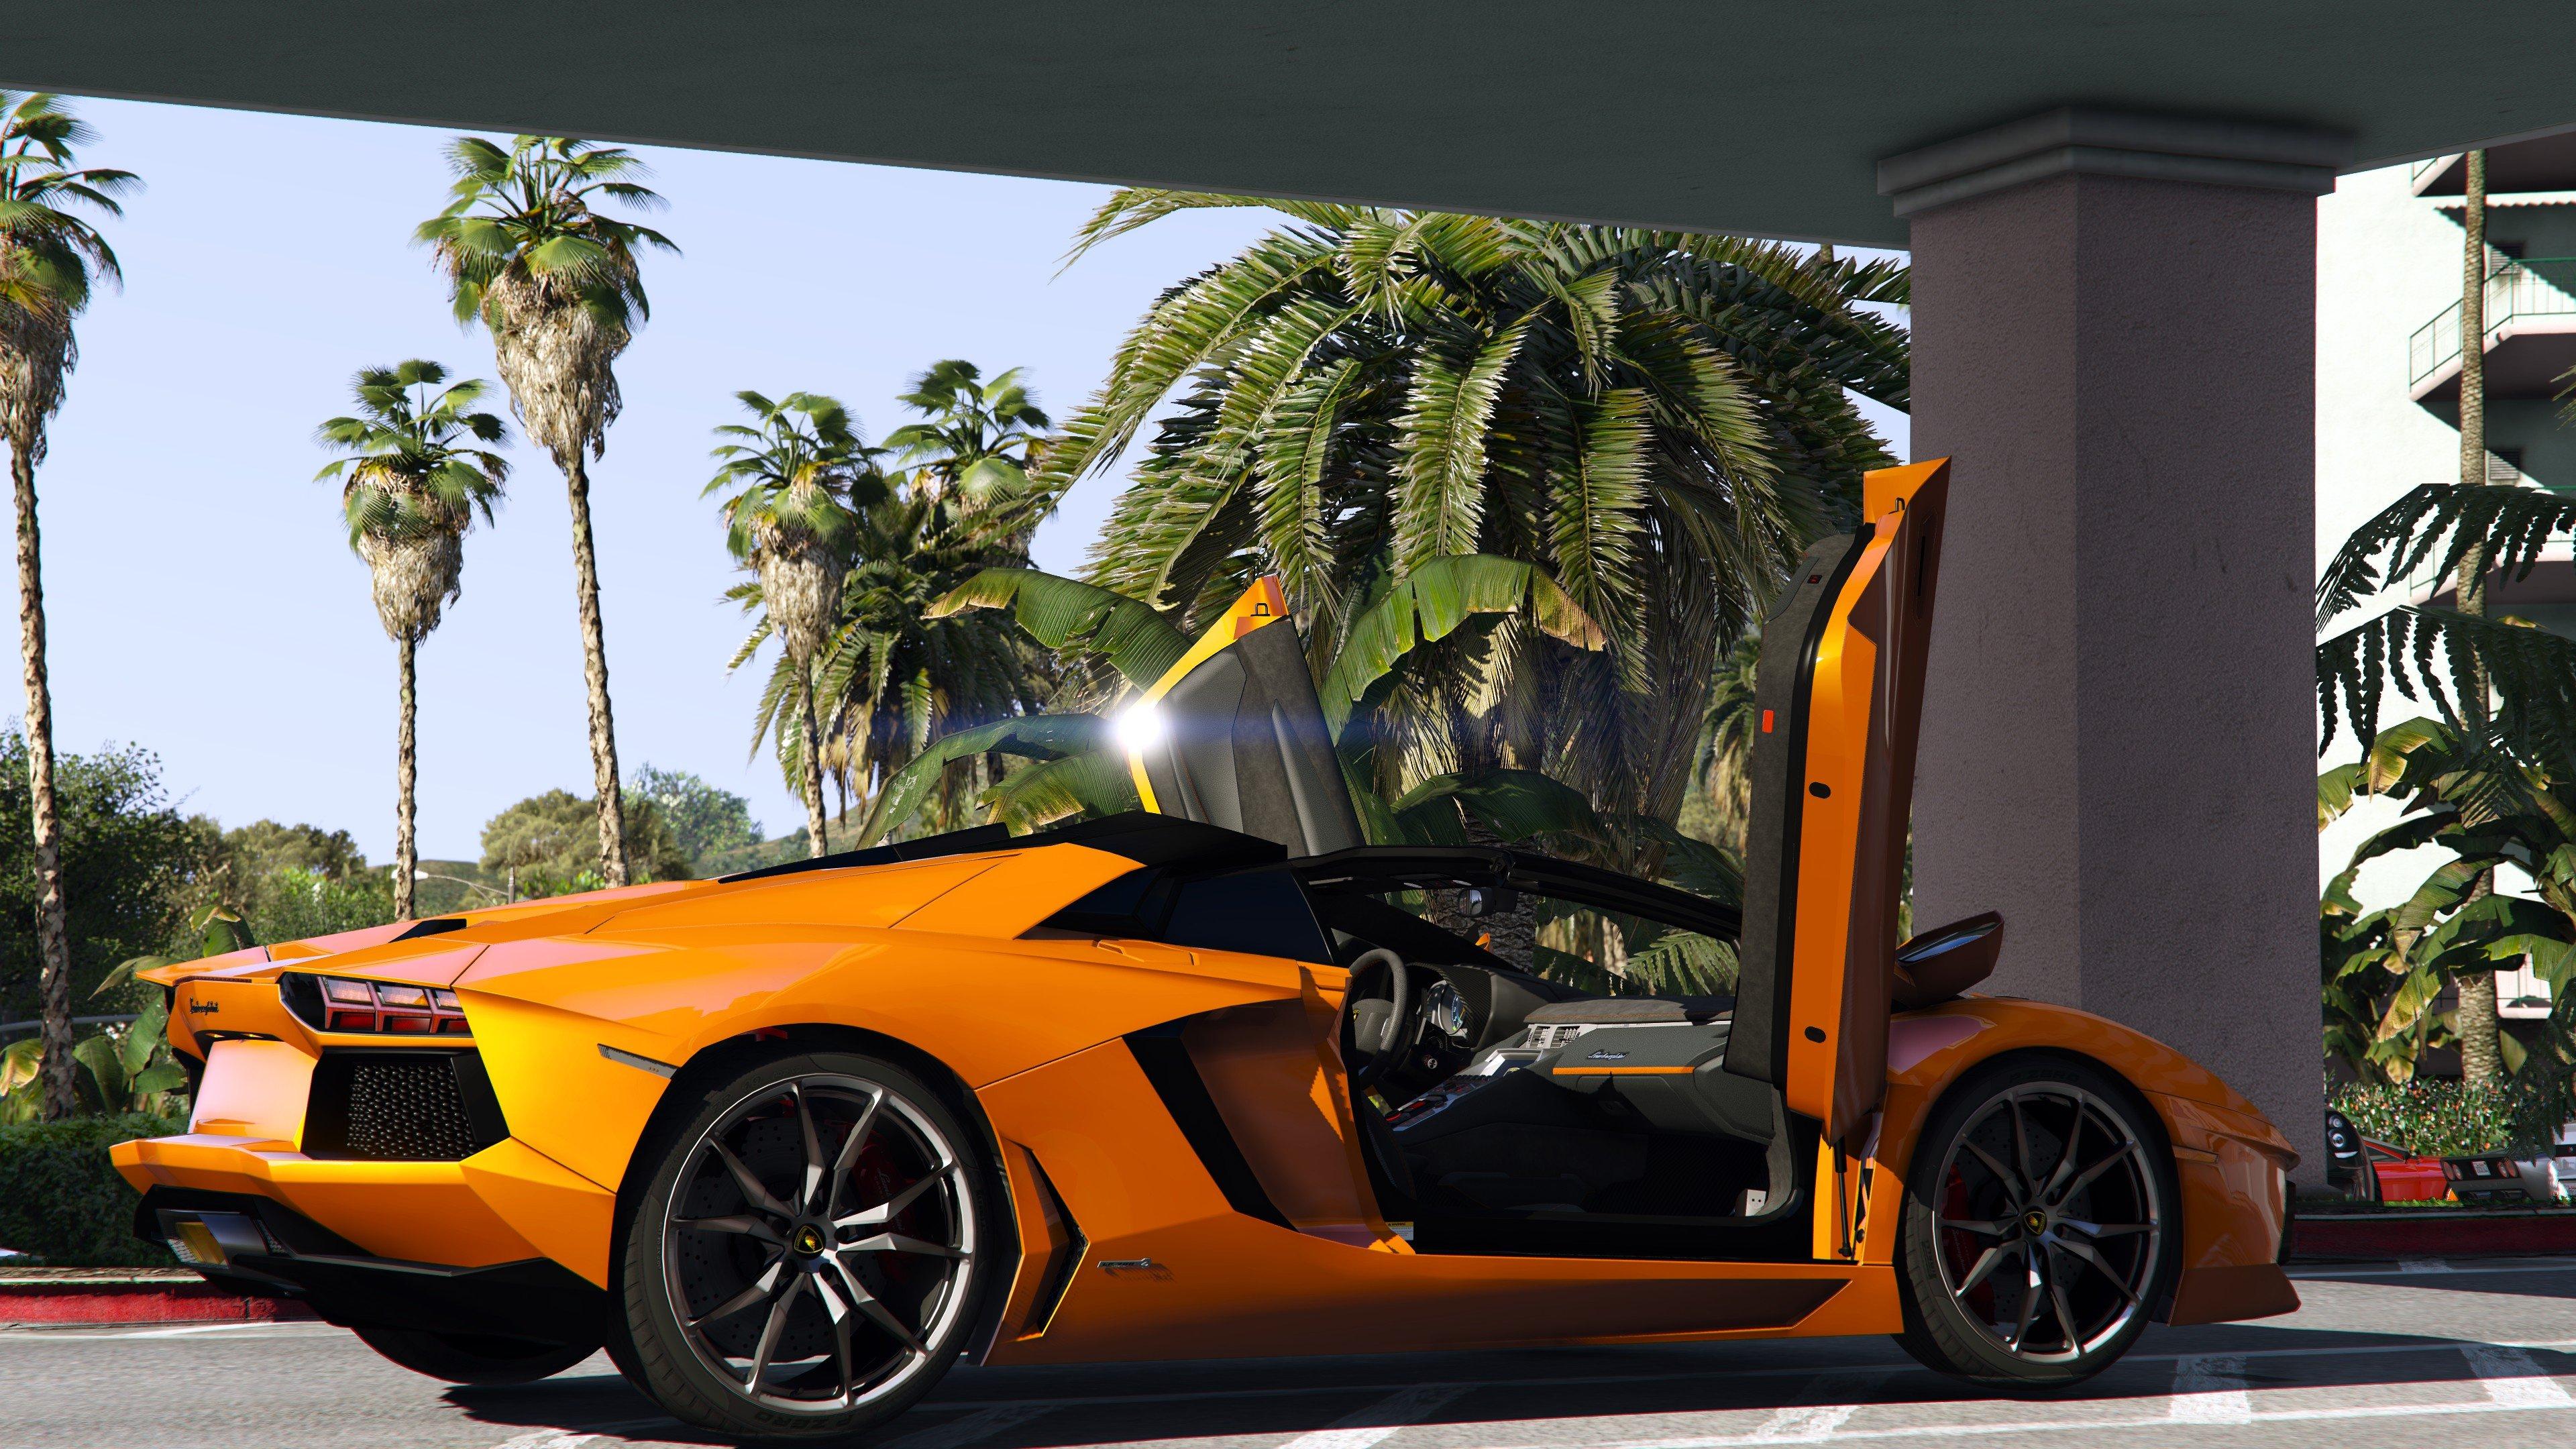 Release 2013 Lamborghini Aventador Lp700 4 Roadster Releases Fivem